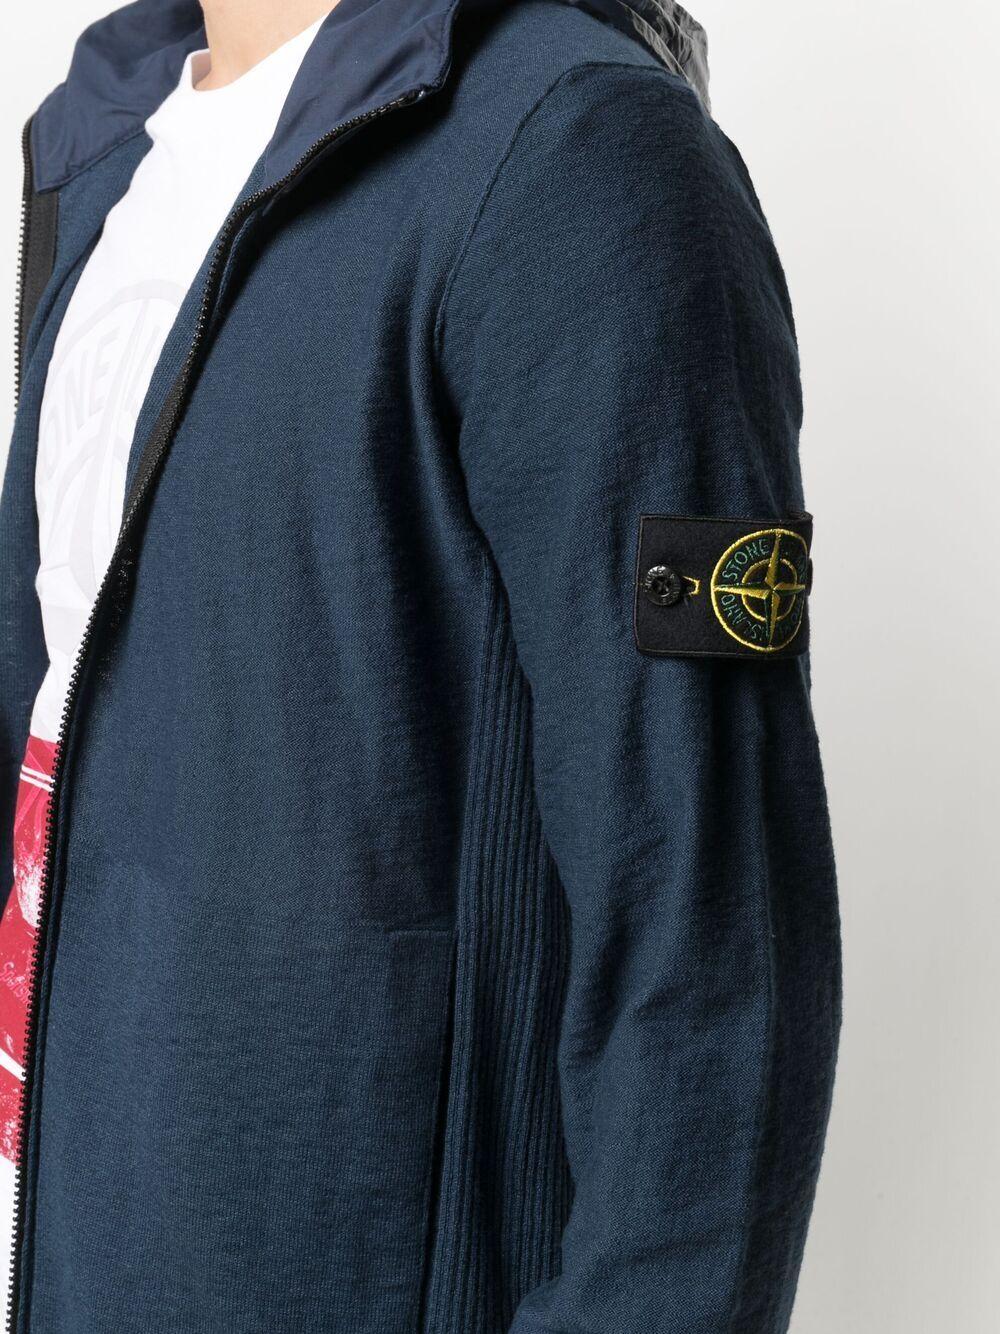 Navy cotton zipped cardigan featuring Stone Island logo at the sleeve STONE ISLAND |  | 7415525B0V0024